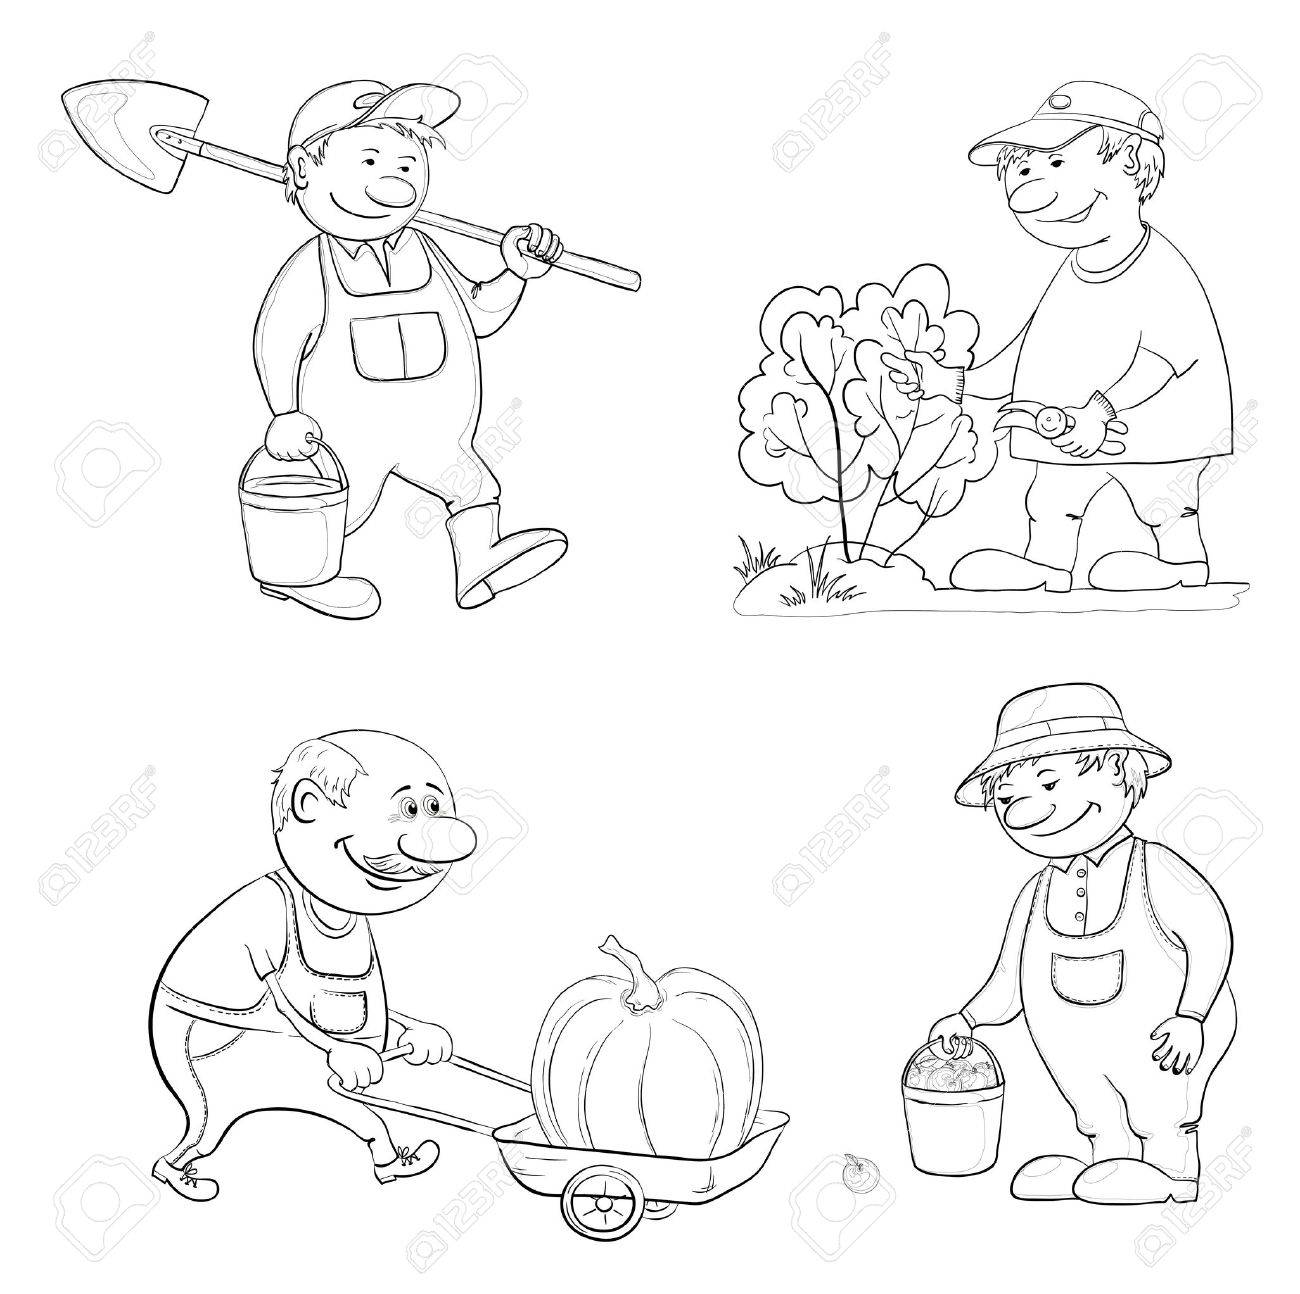 Cartoon Pics of Gardening Cartoon Gardeners Work With a